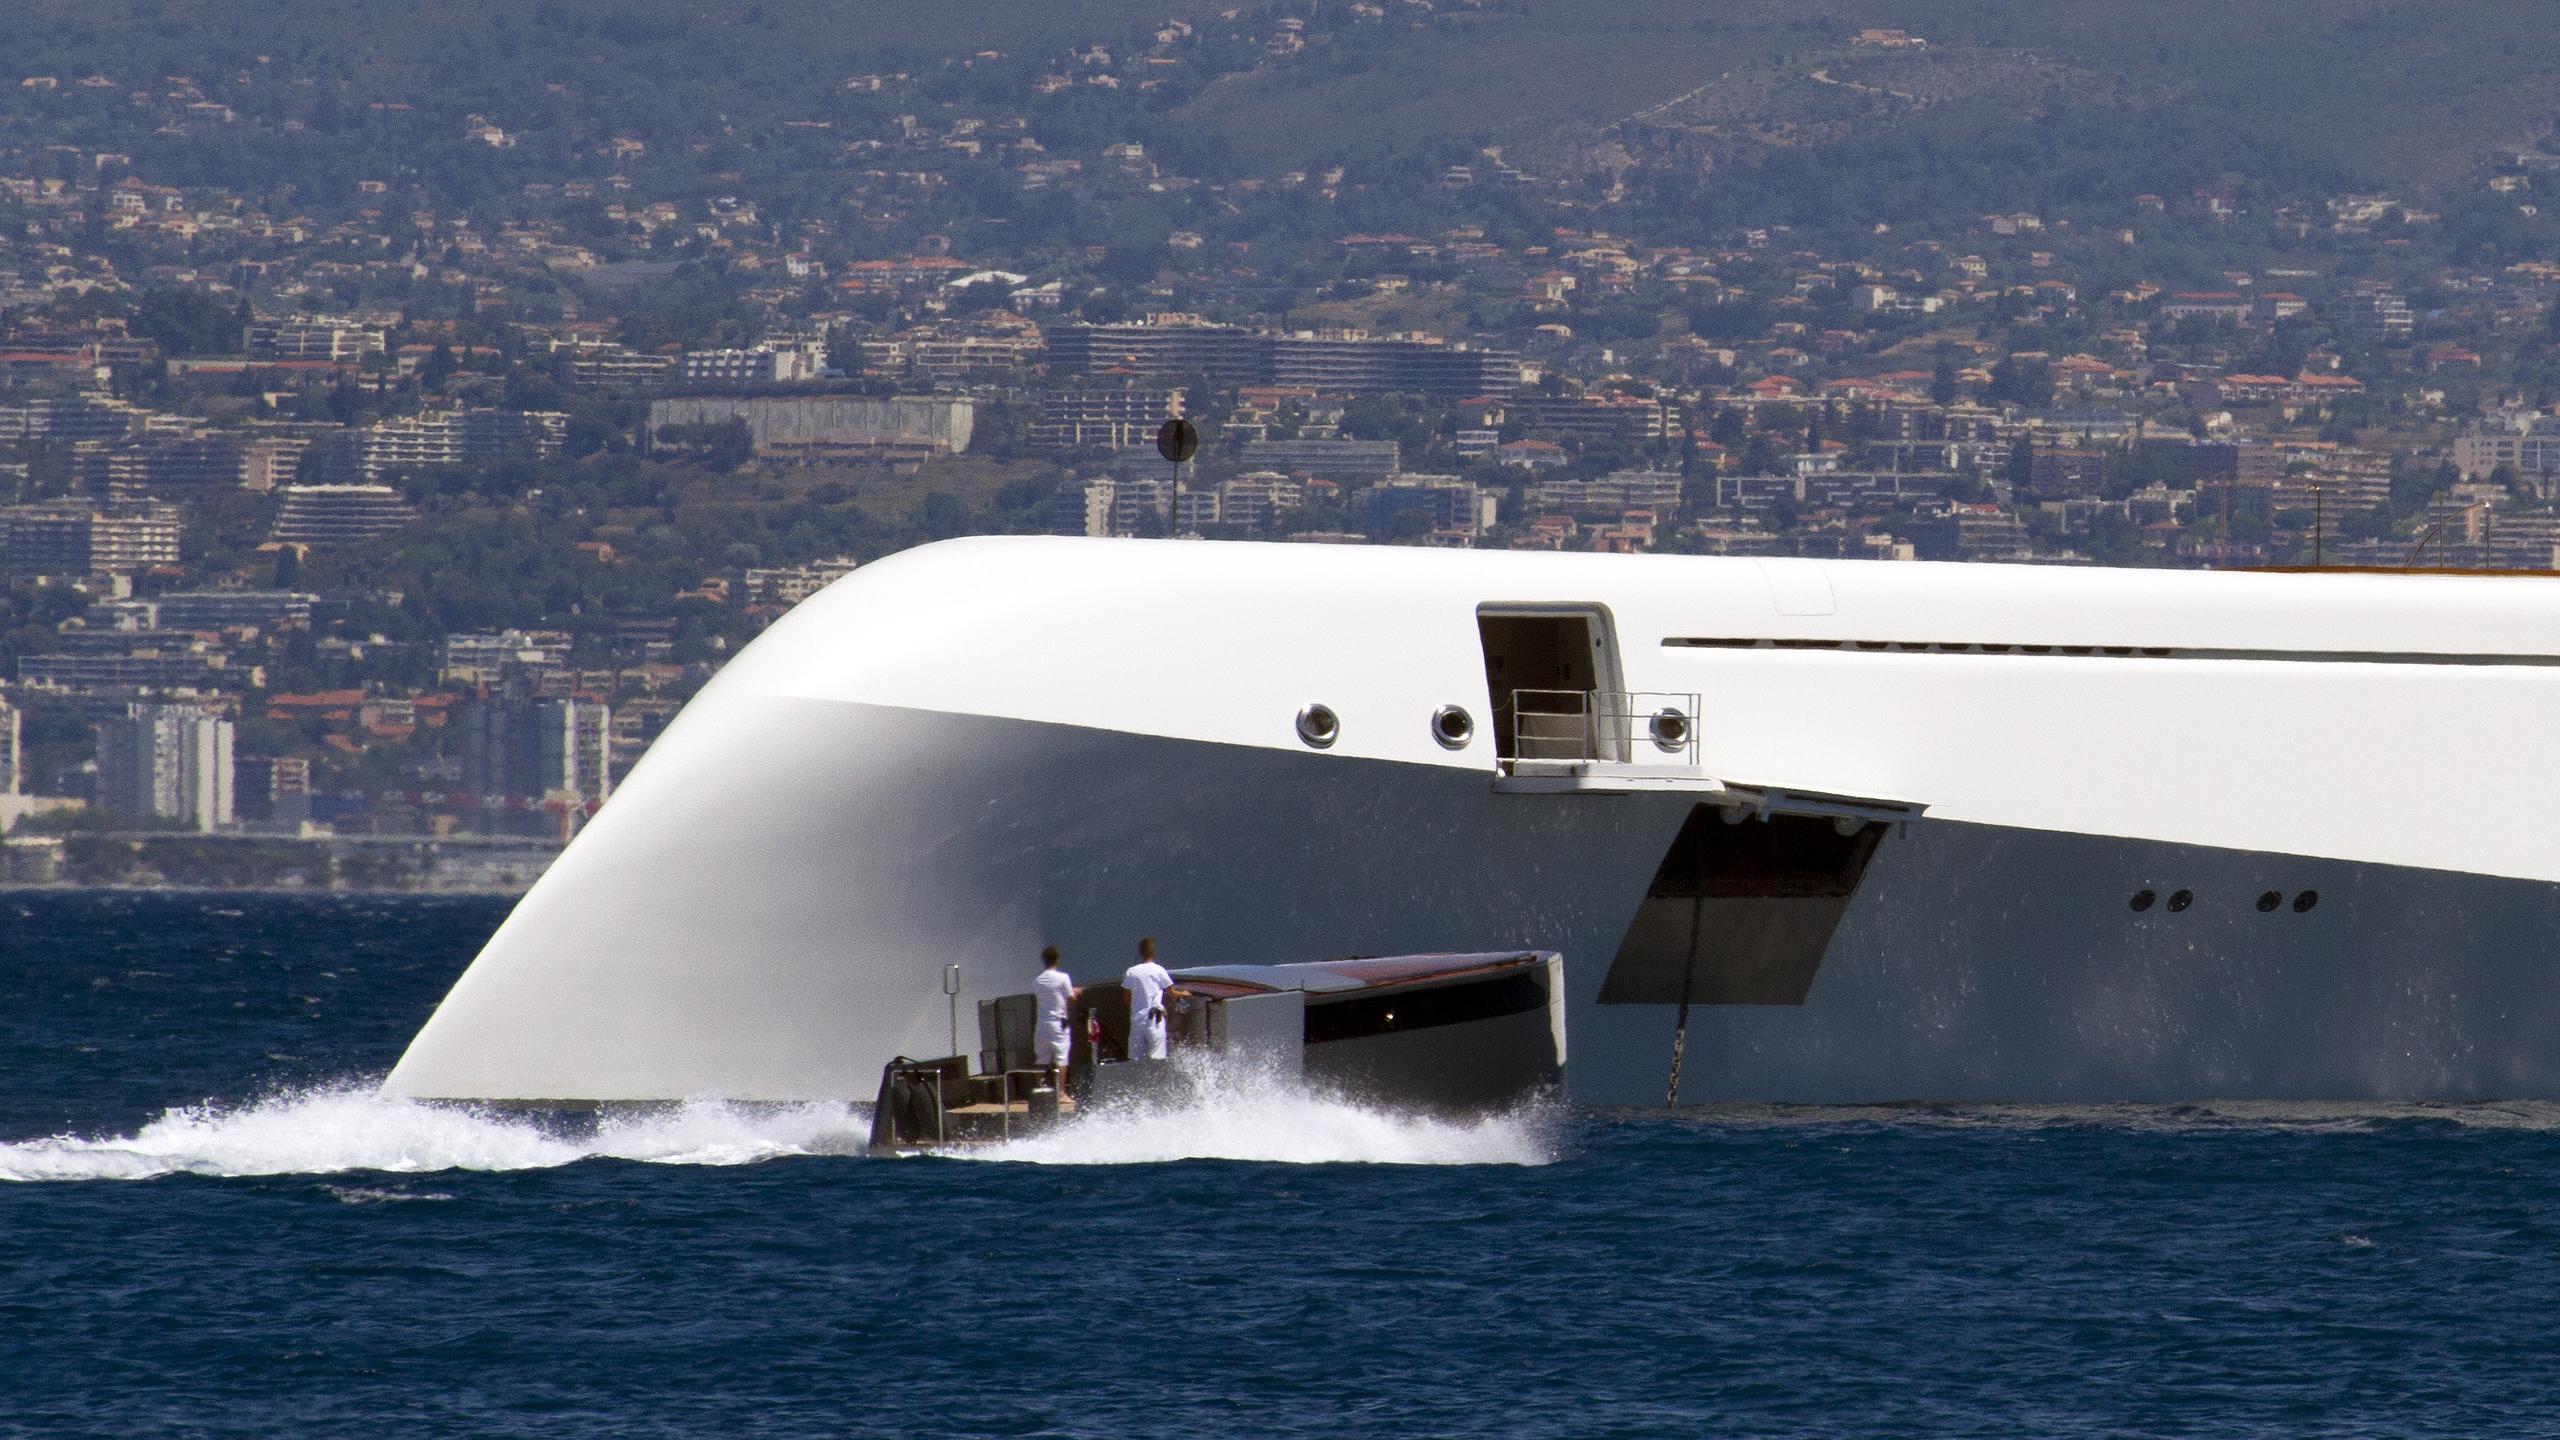 superyacht-a-motor-yacht-blohm-voss-2008-119m-bow-details-tender